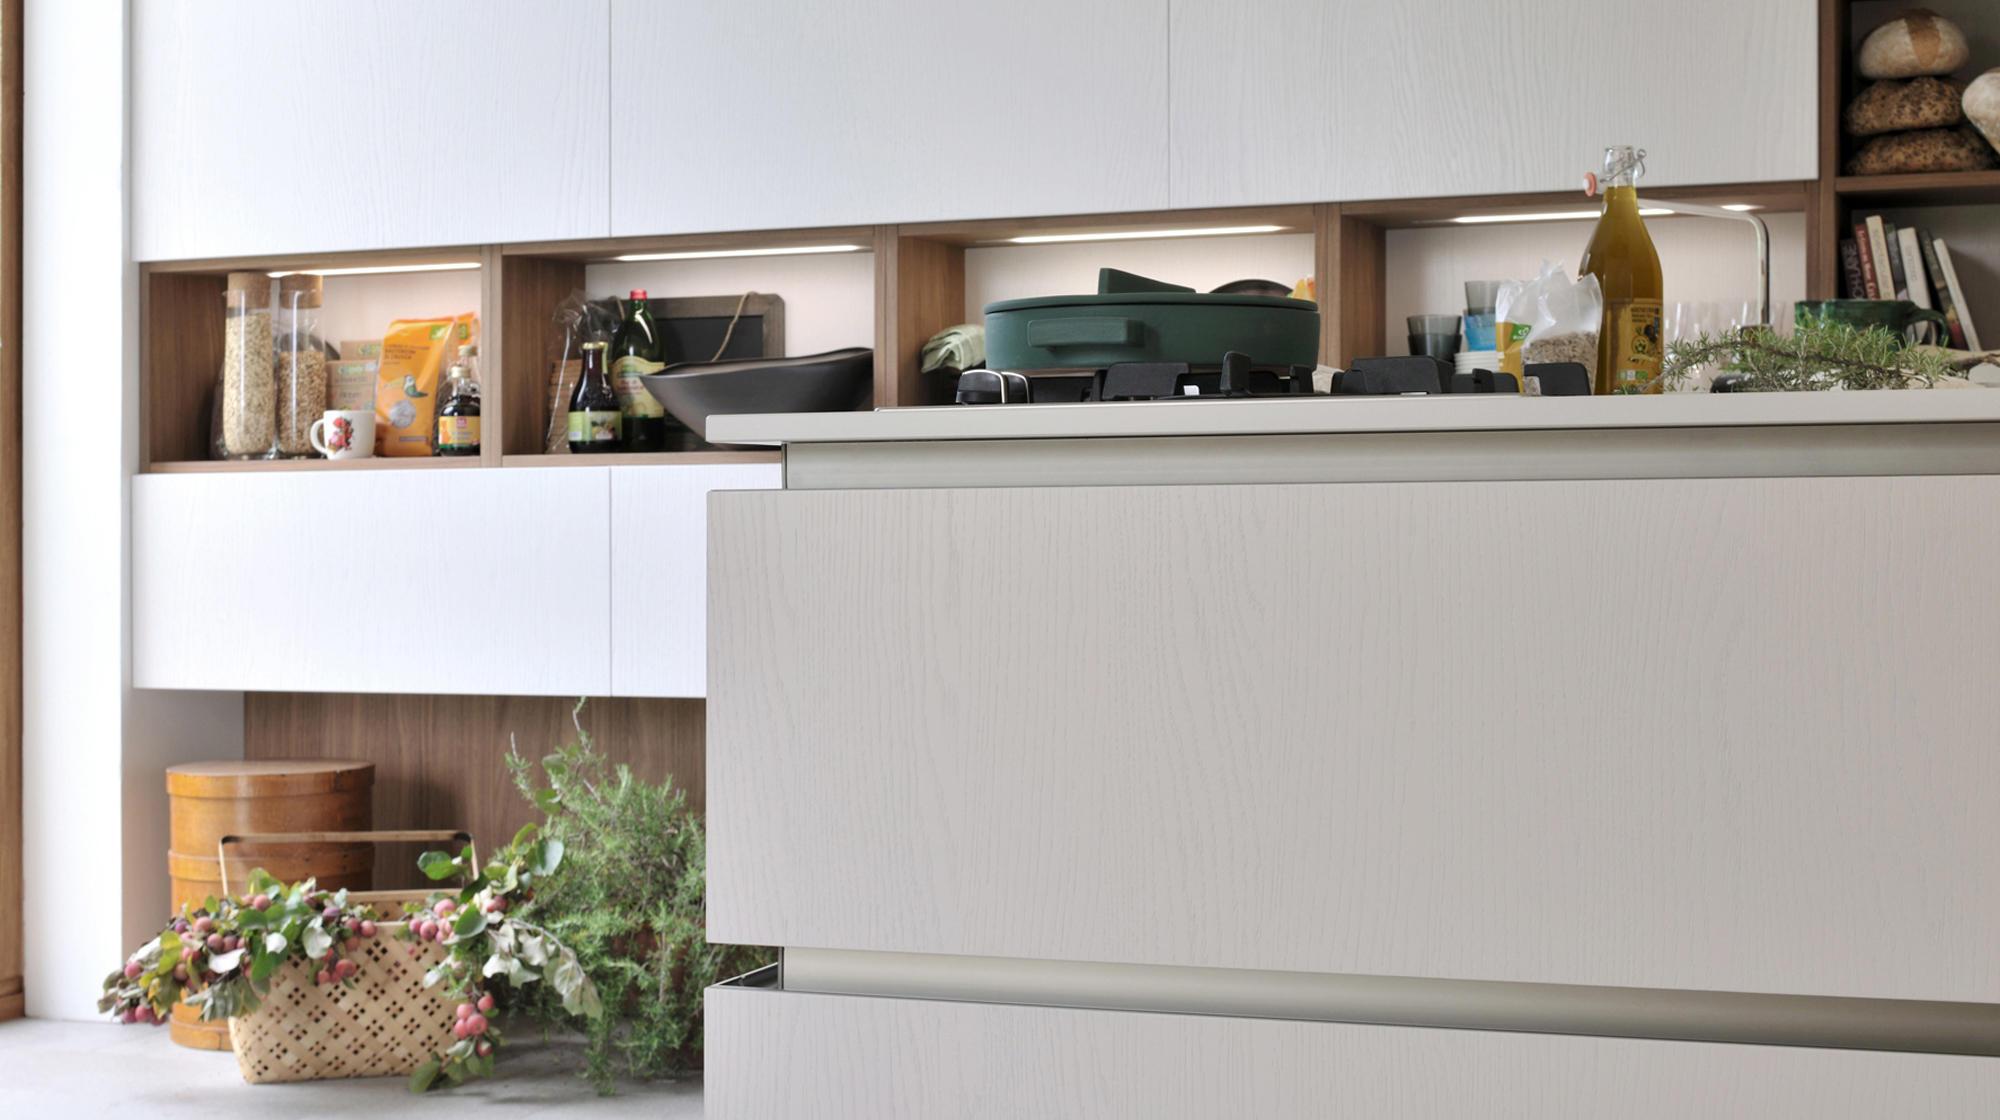 Cucine moderne veneta cucine good tablet di veneta cucine - Cucine a buon prezzo ...